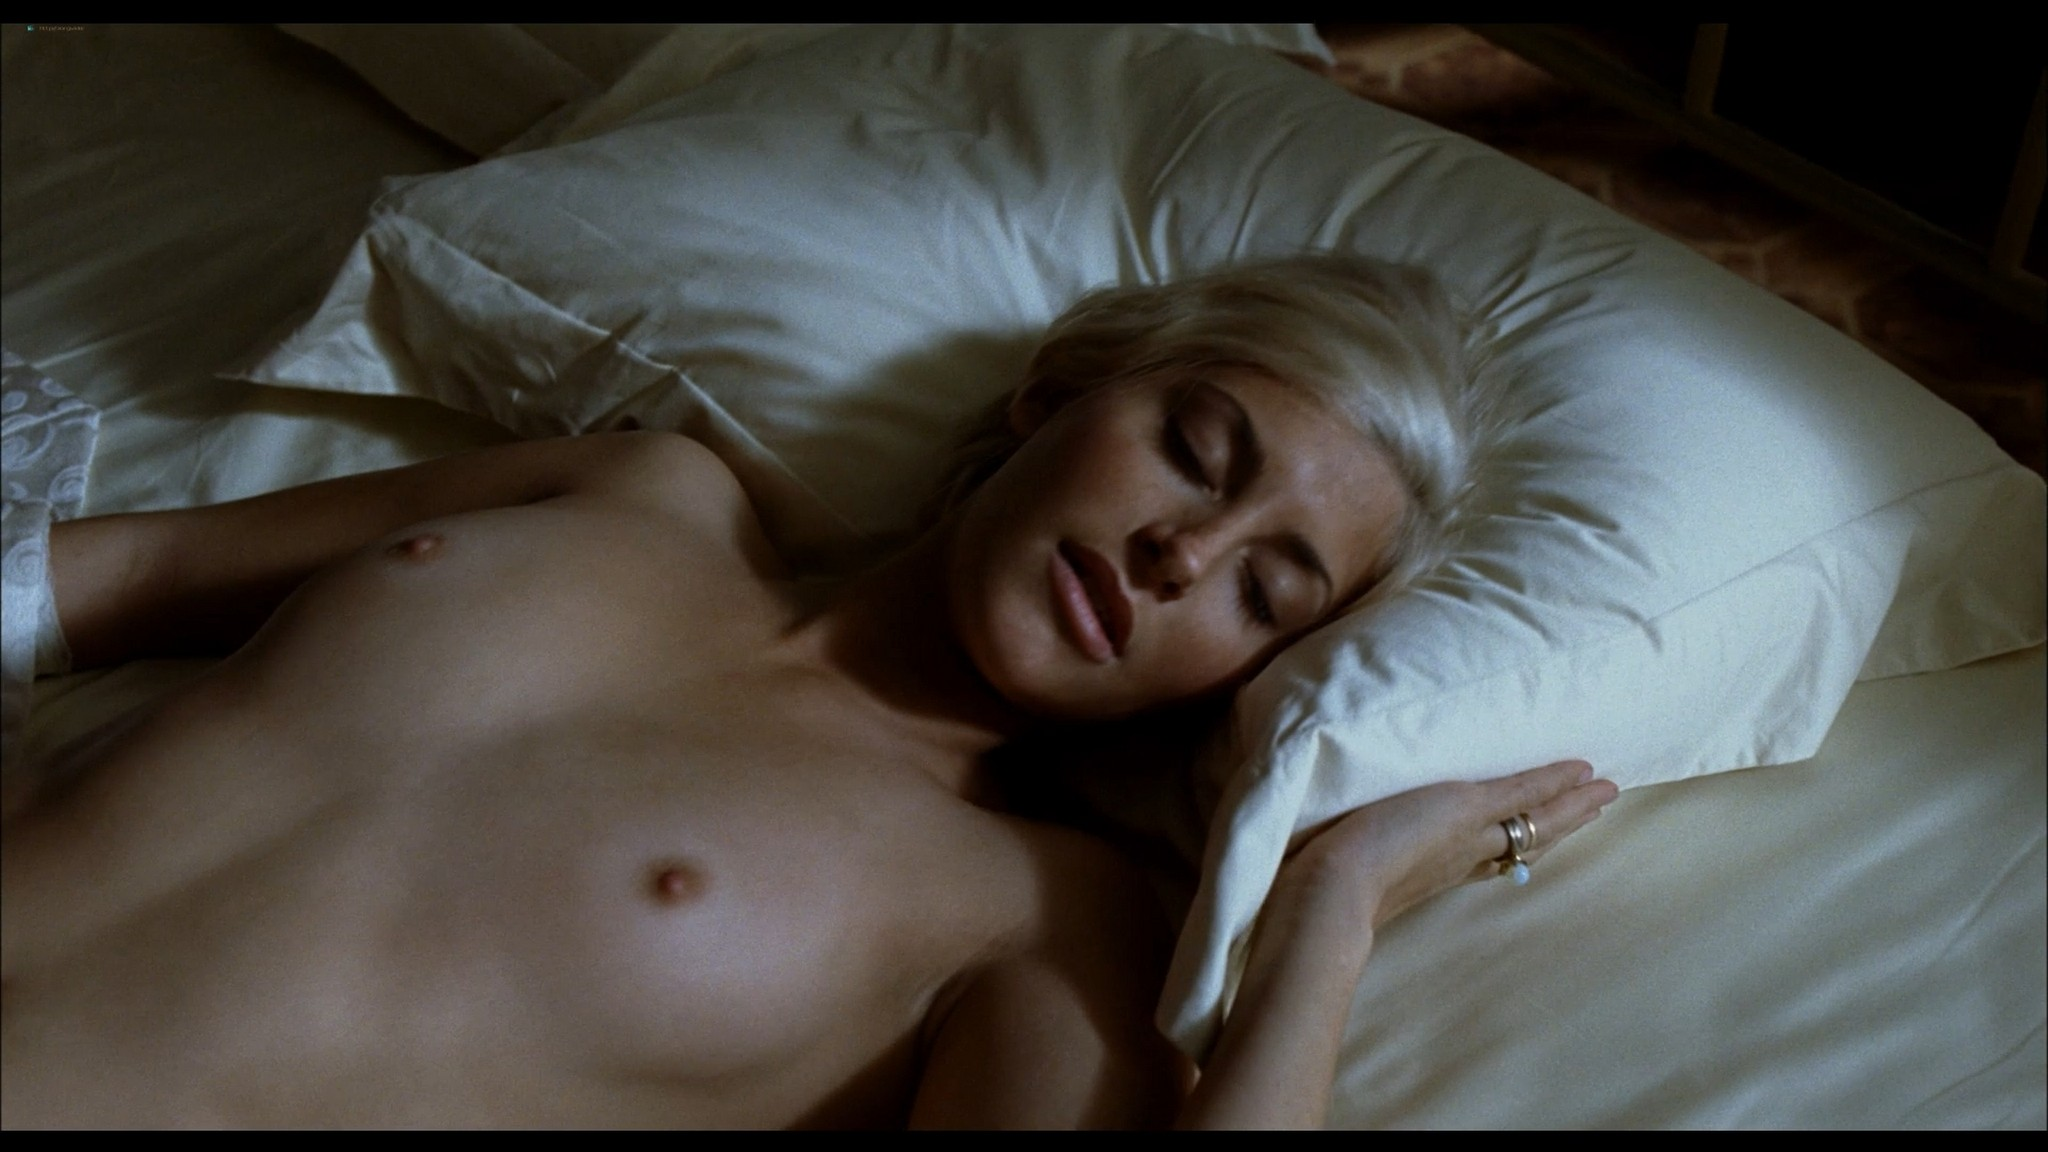 Avalon Barrie nude and Lyudmila Shiryaeva nude full frontal Sappho 2008 HD 1080p BluRay REMUX 14